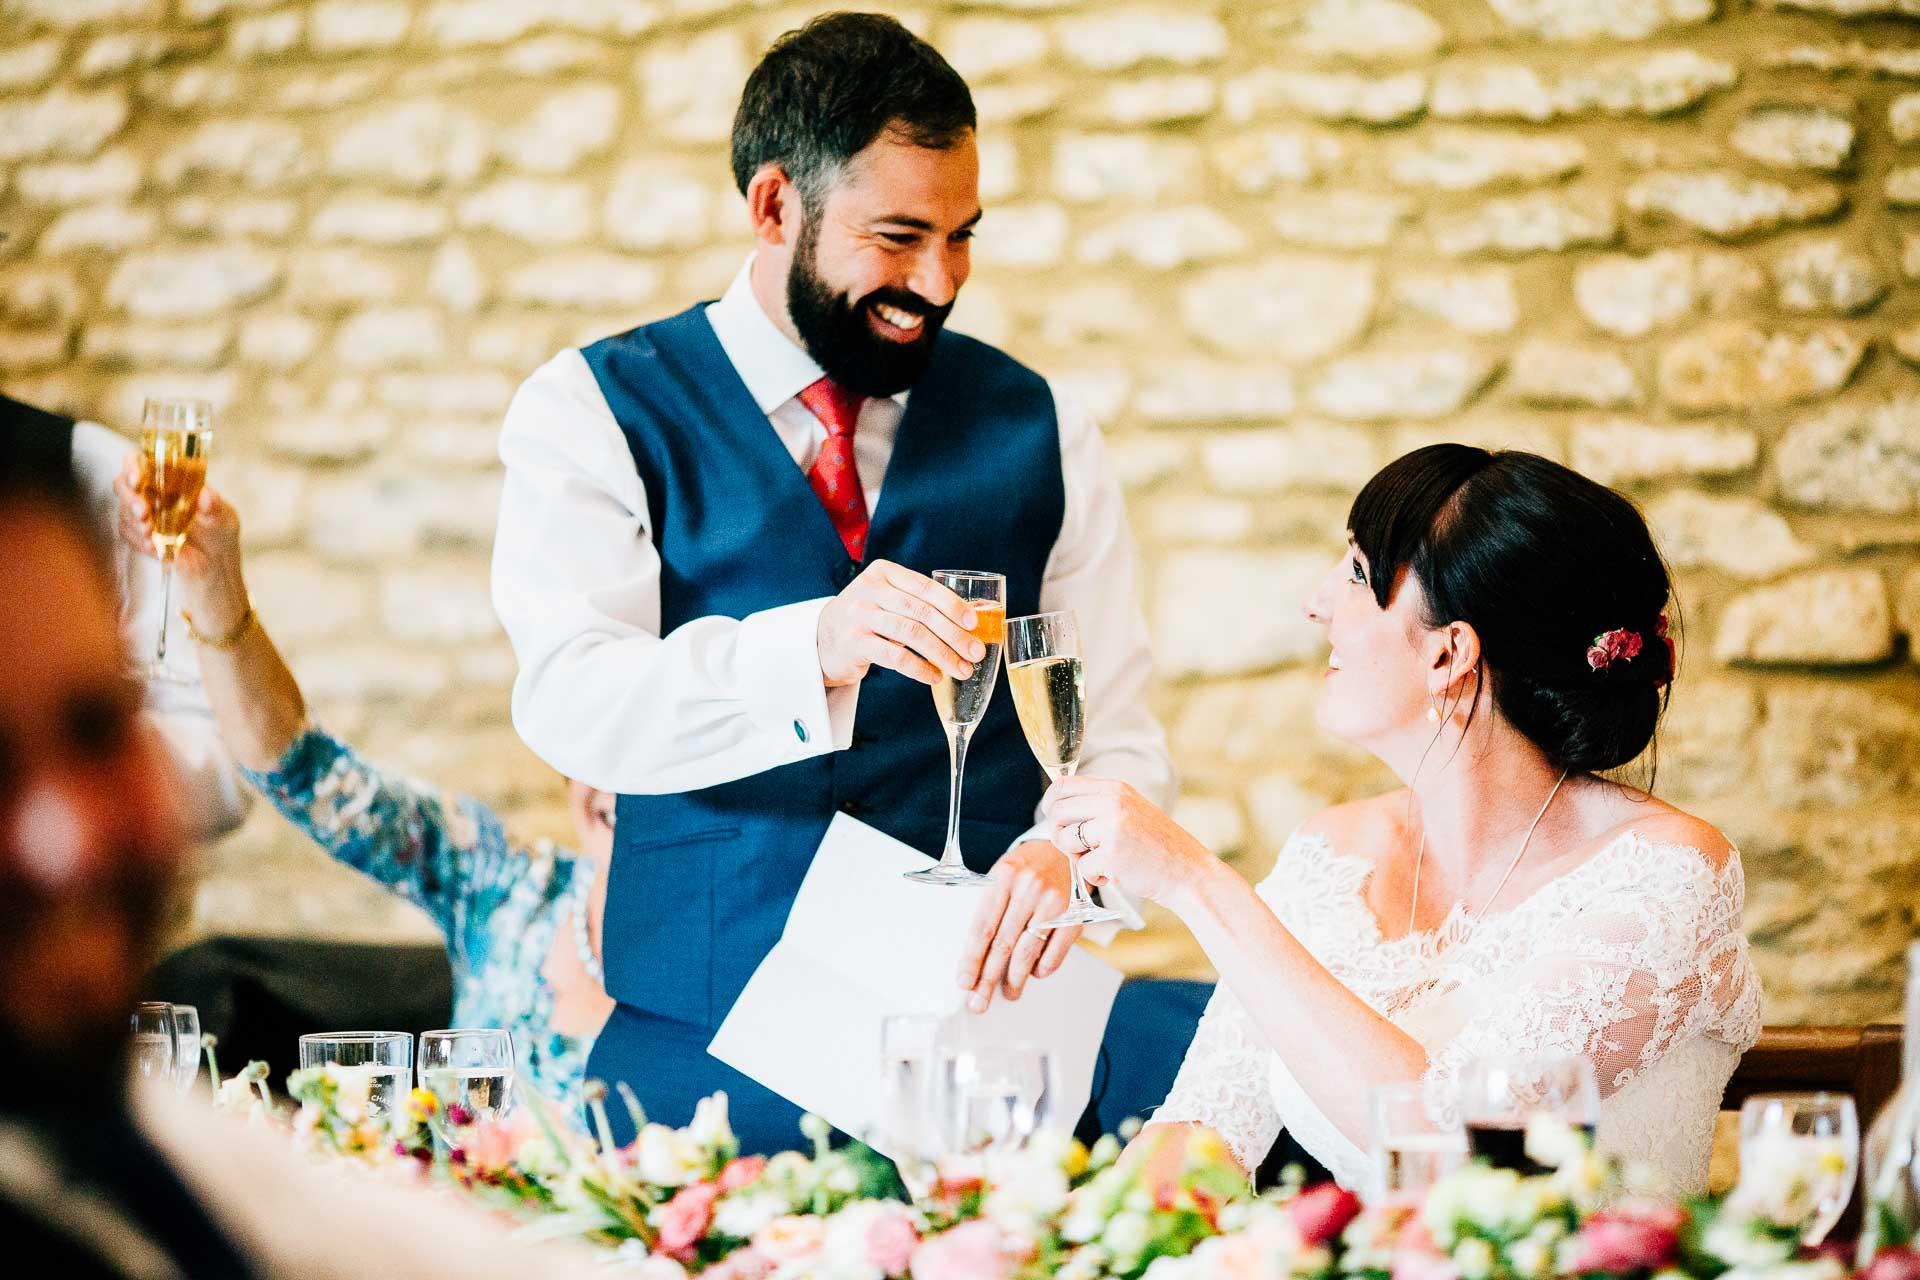 Caswell House Wedding Photography - Emma & Pete-107